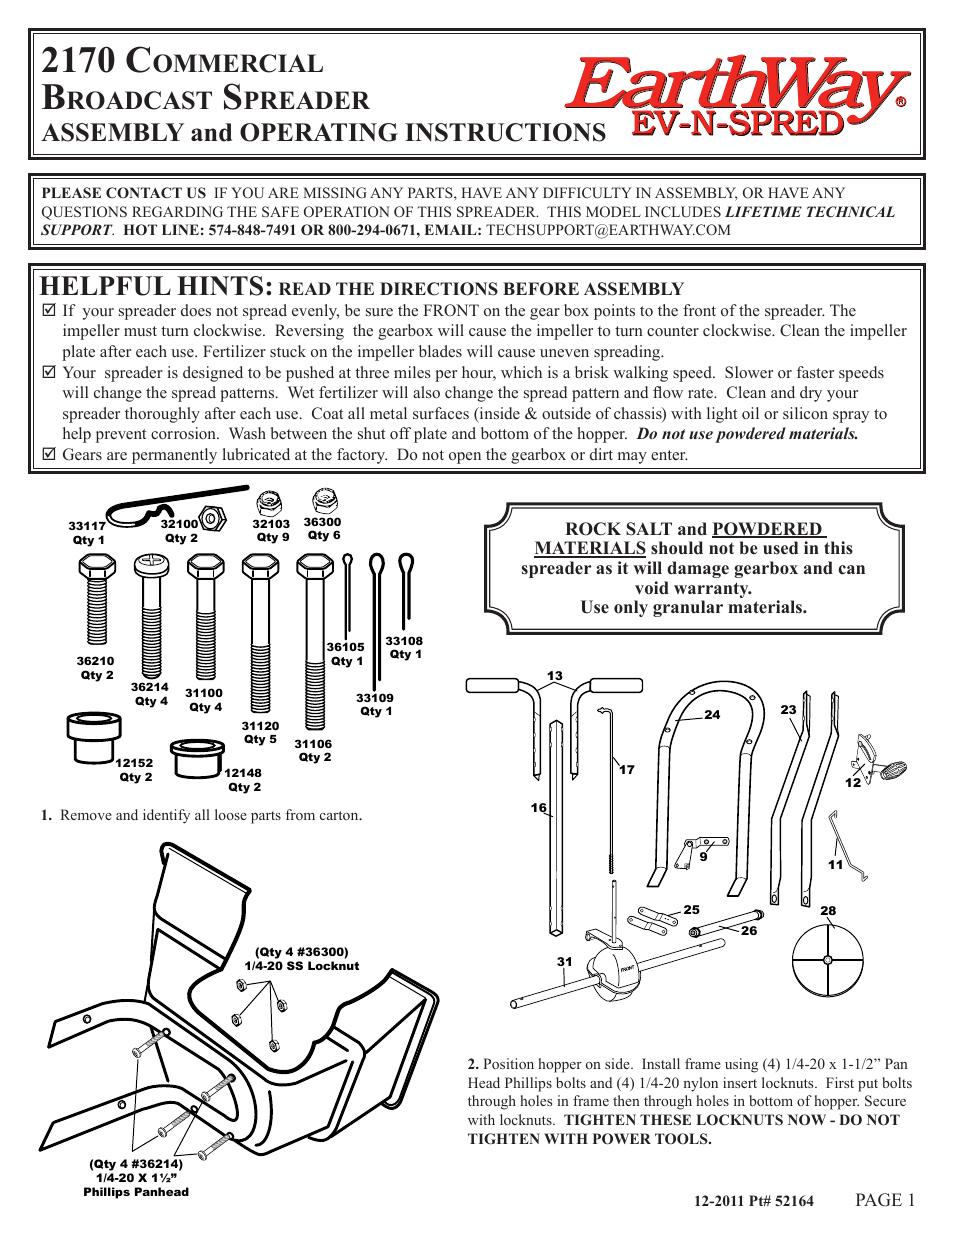 scotts speedy green 1000 manual pdf